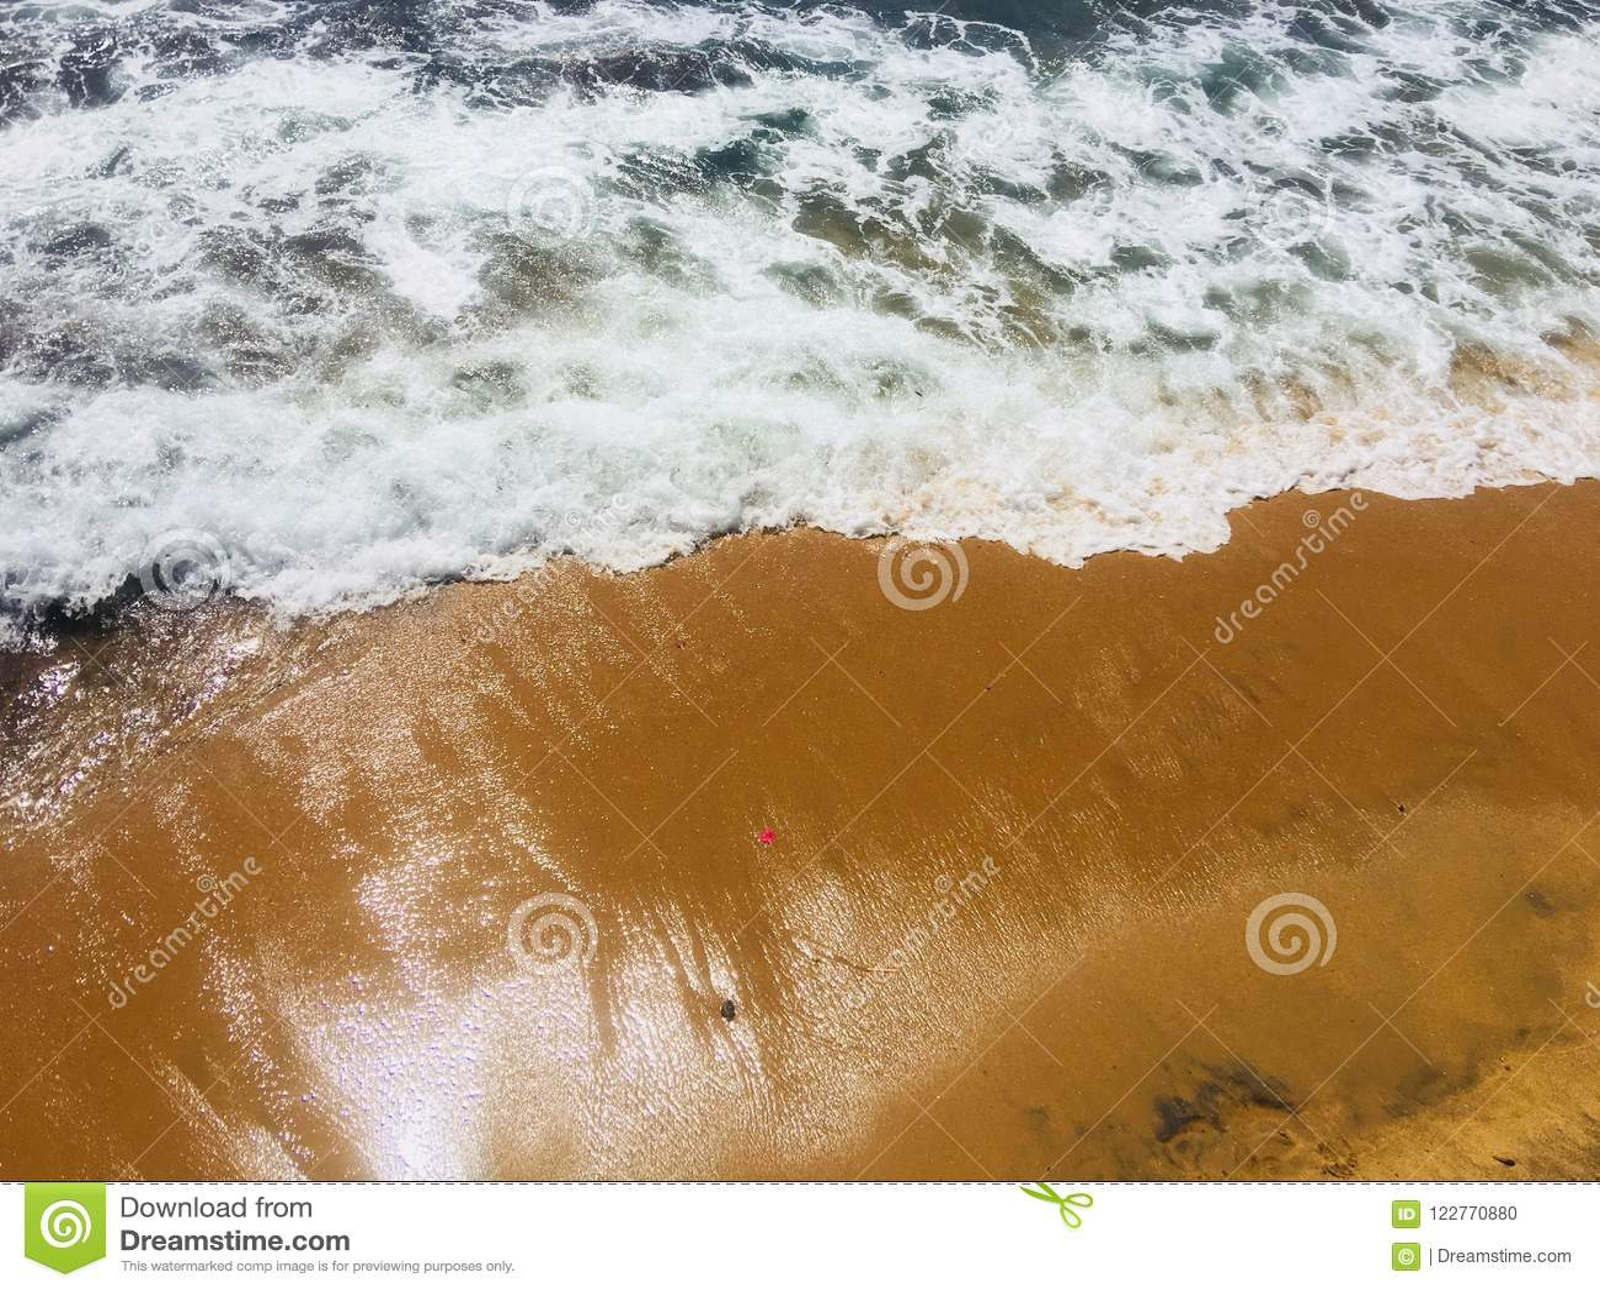 Galleface beach of sri lanka